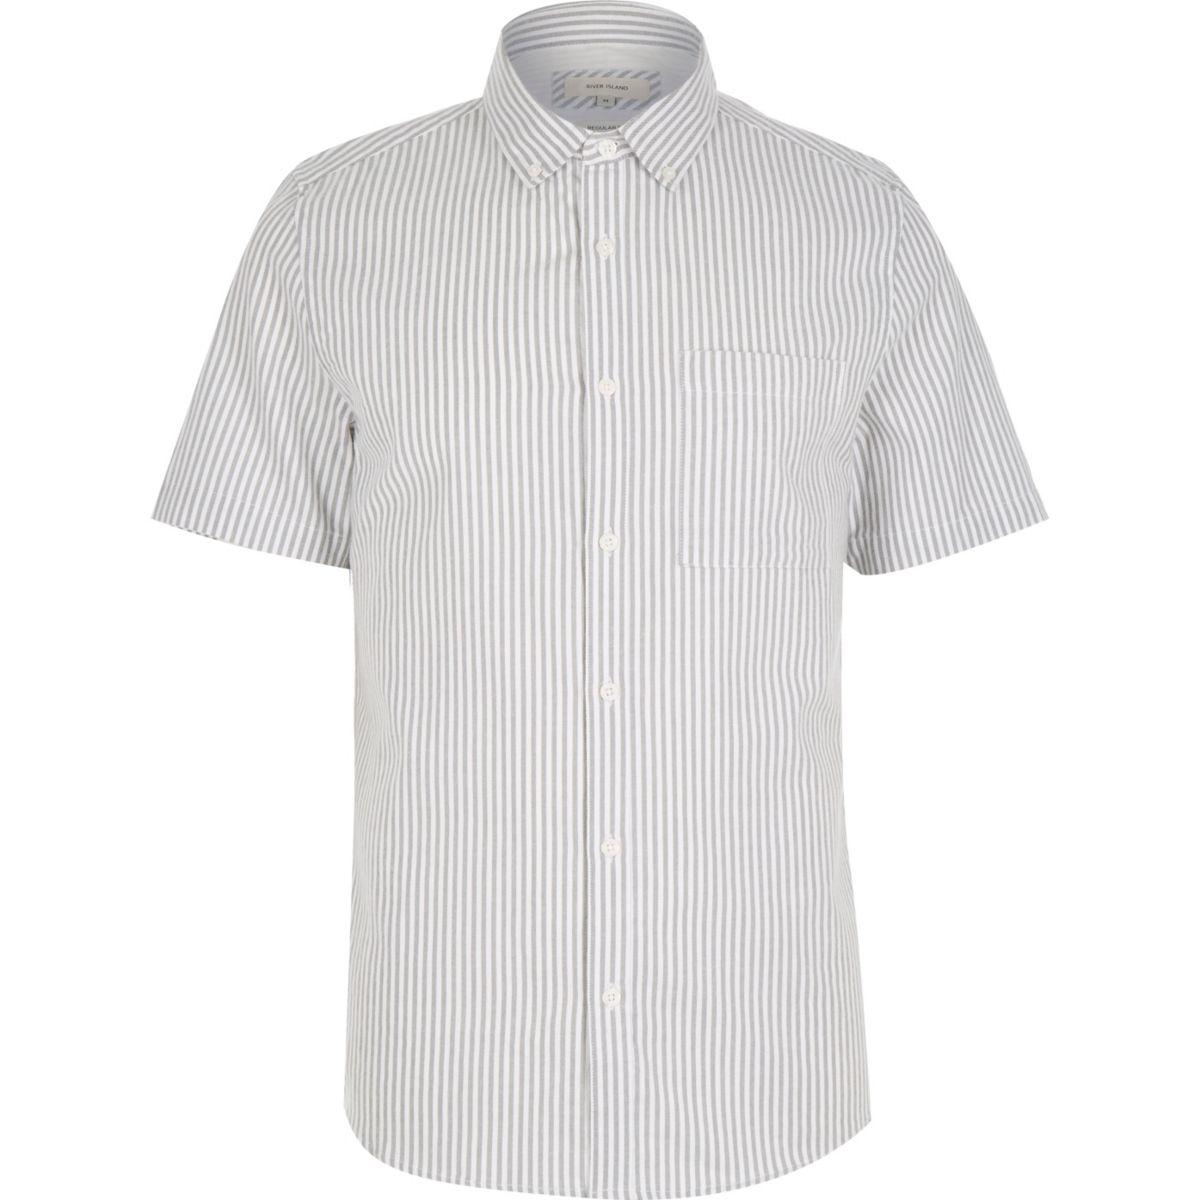 Grey stripe short sleeve shirt